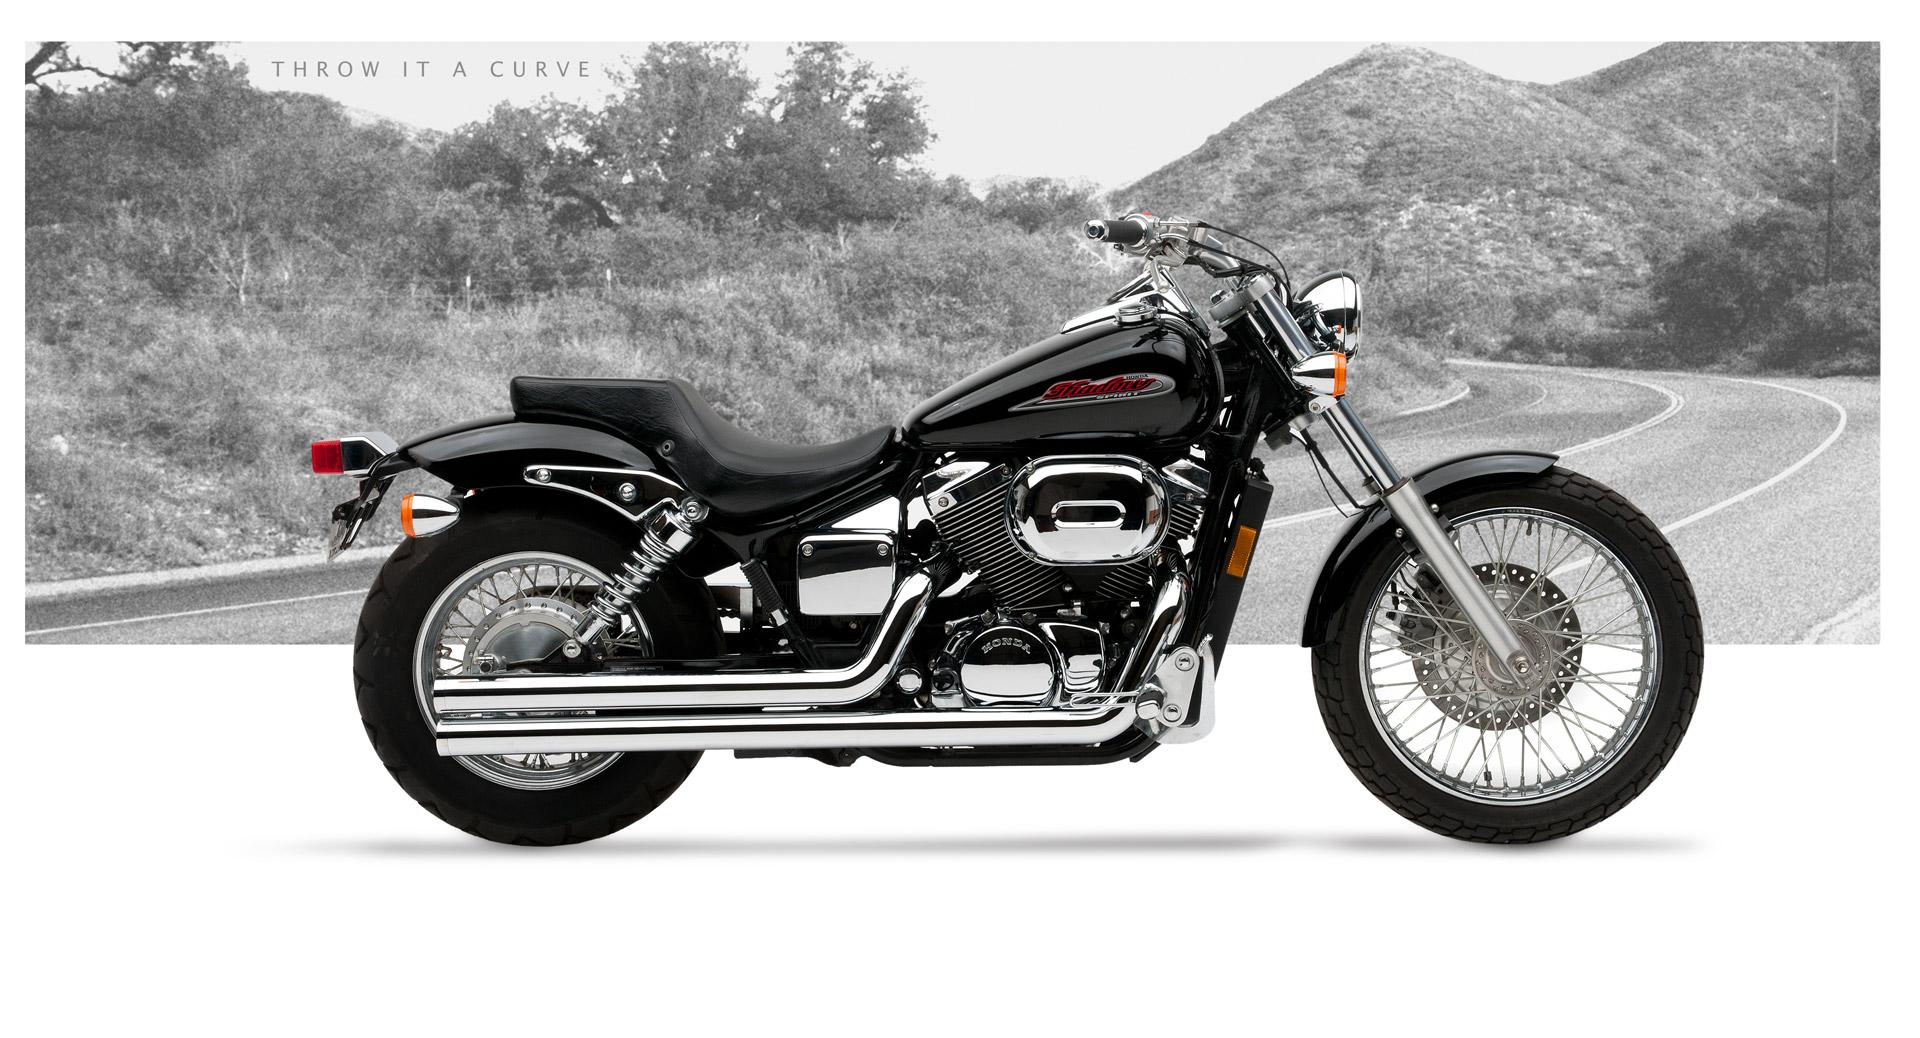 Honda vt 750dc shadow spirit motorcycle exhaust american classic ii